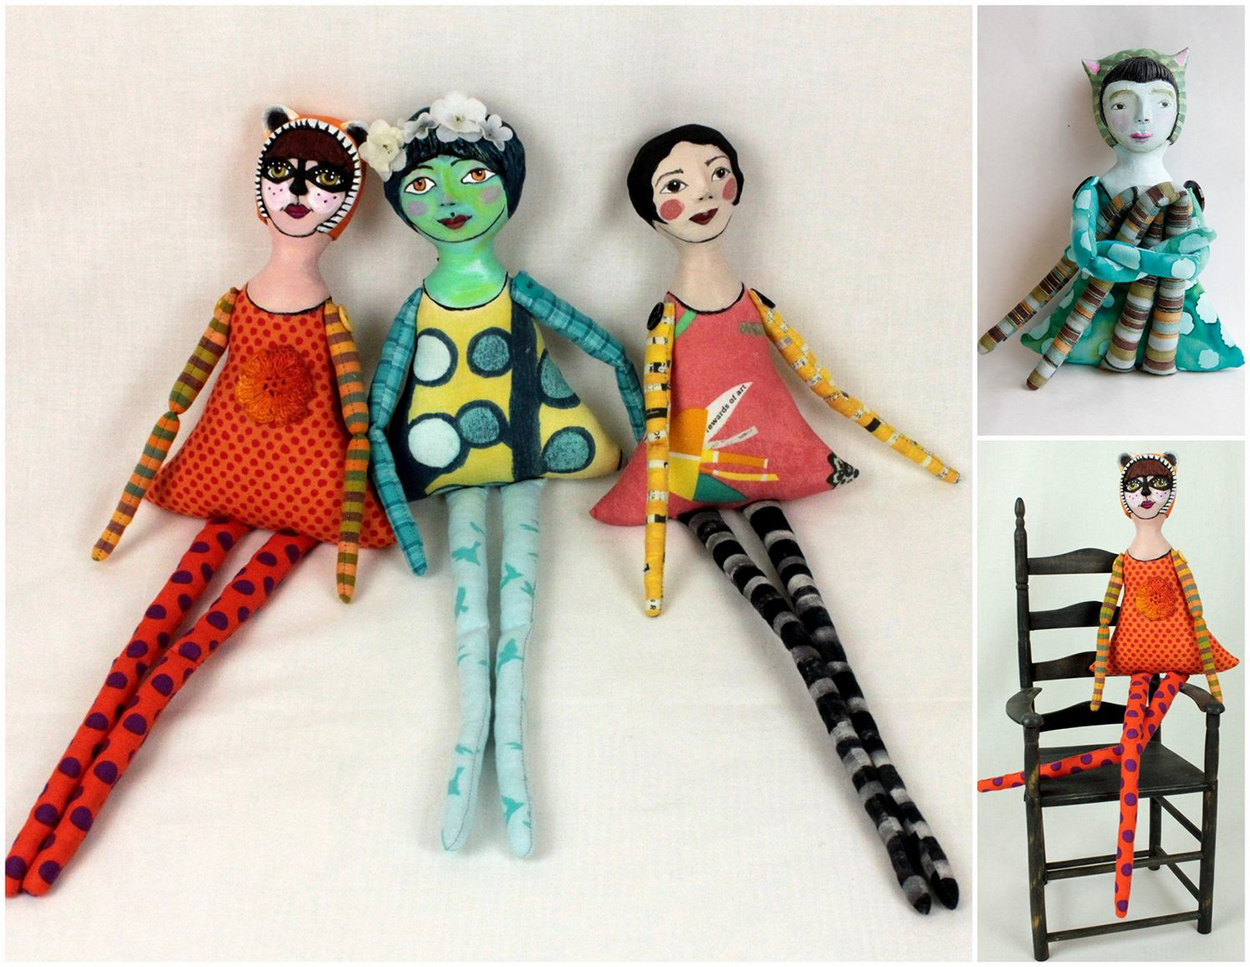 Long-legged Lolas collection